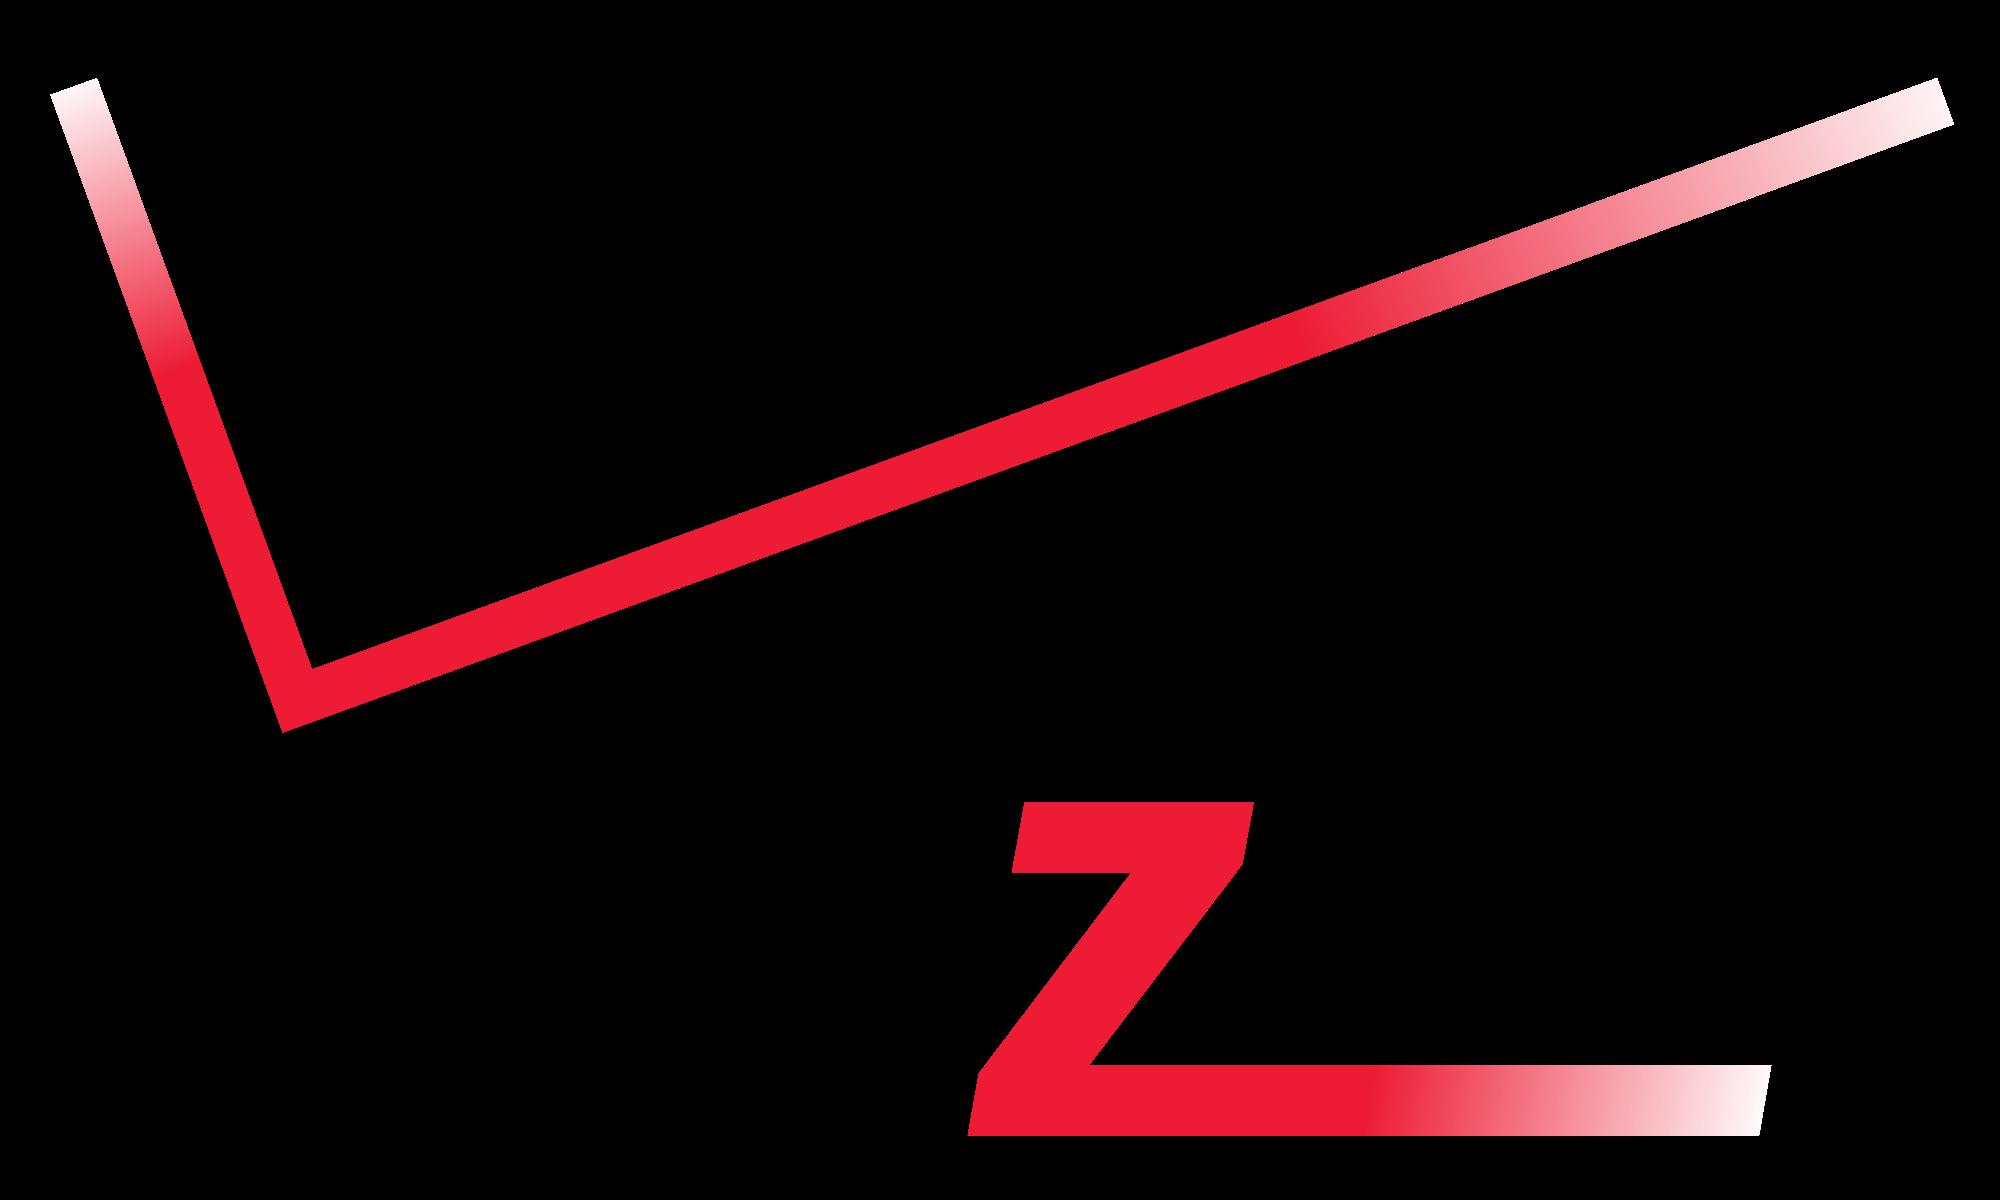 sacl_vz_verizon_communications_logo_3.png